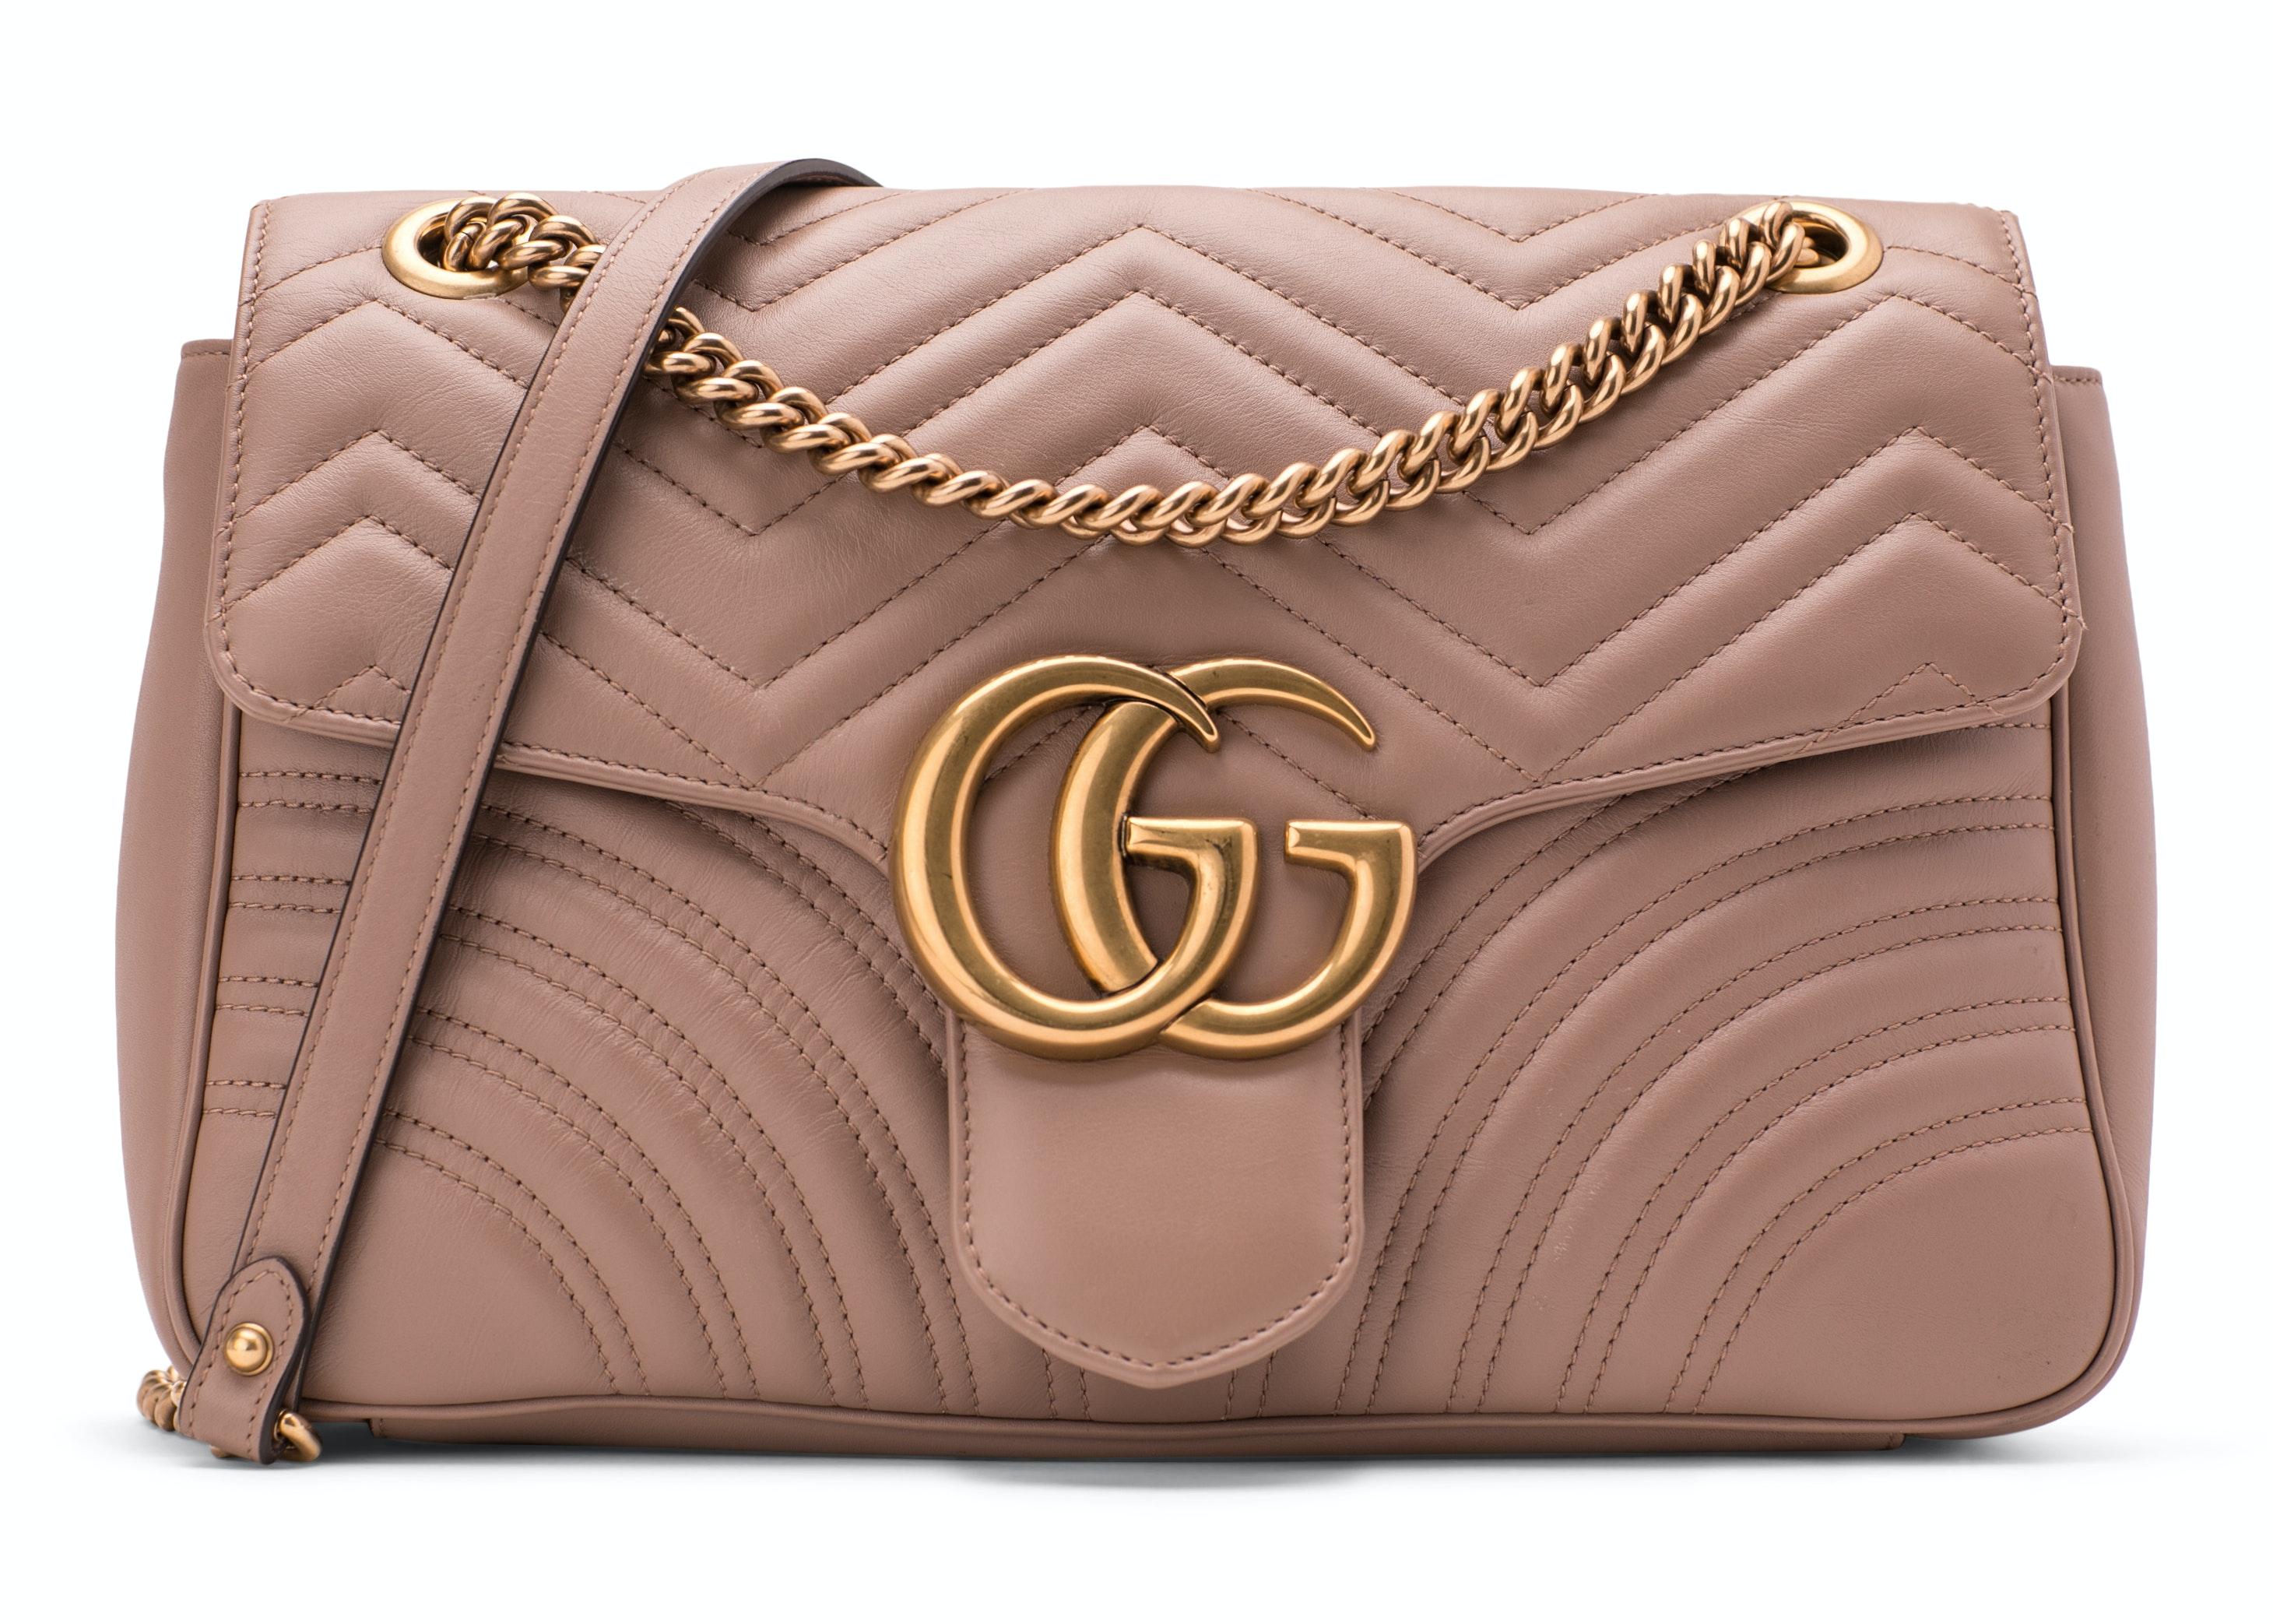 Gucci Shoulder GG Marmont Medium Dusty Pink